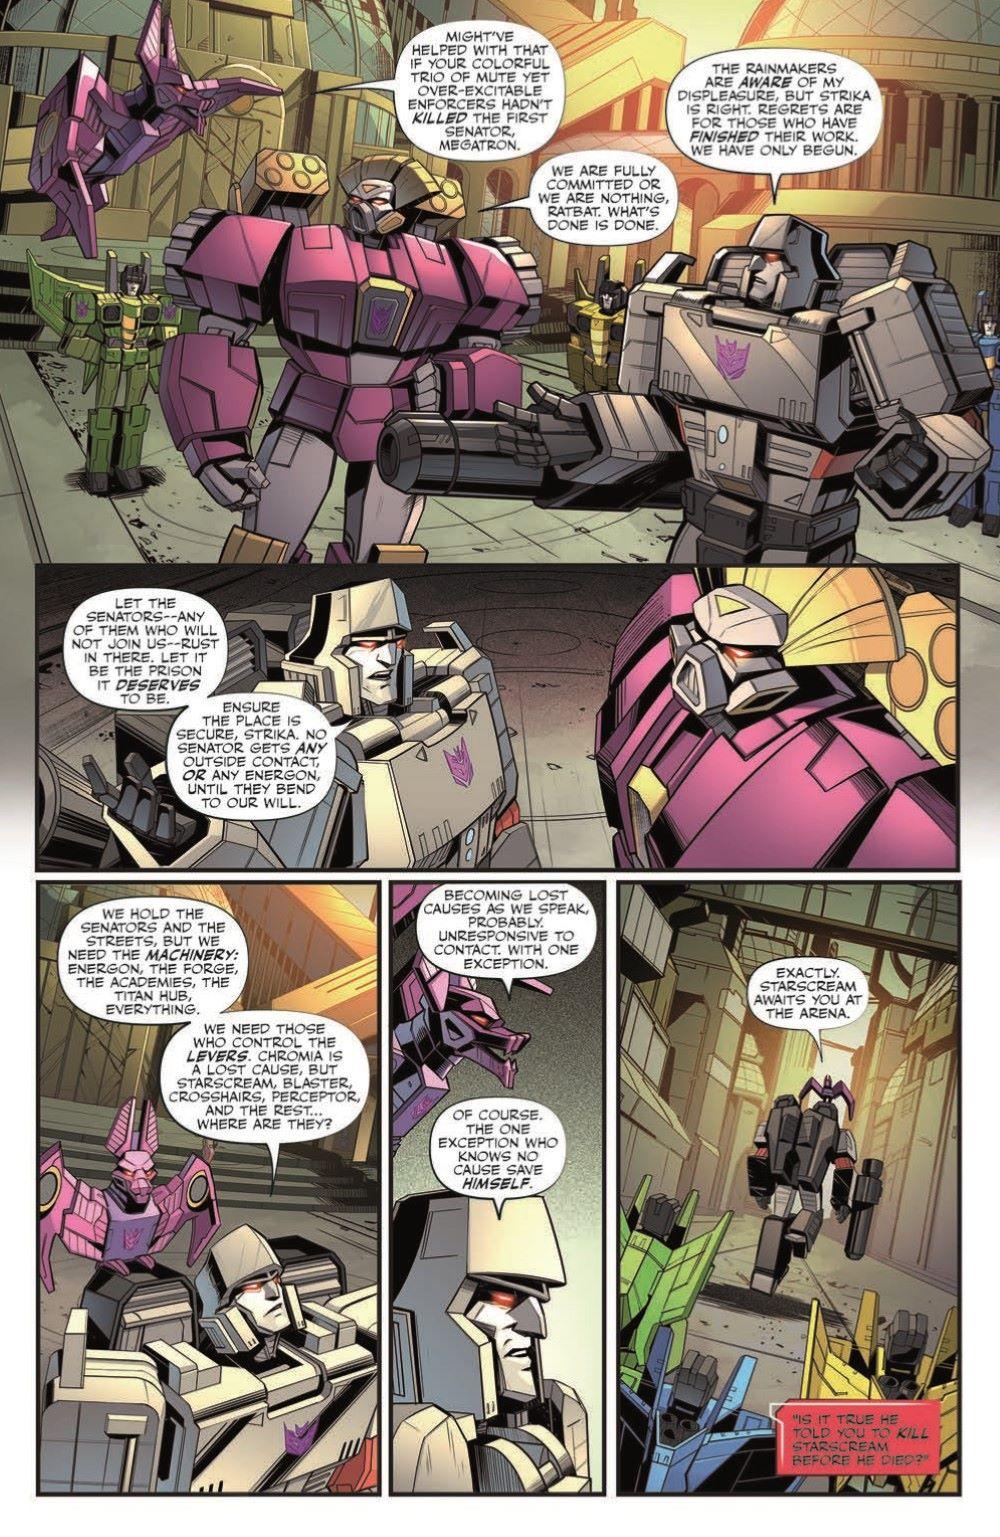 TF26-pr-7 ComicList Previews: TRANSFORMERS #26